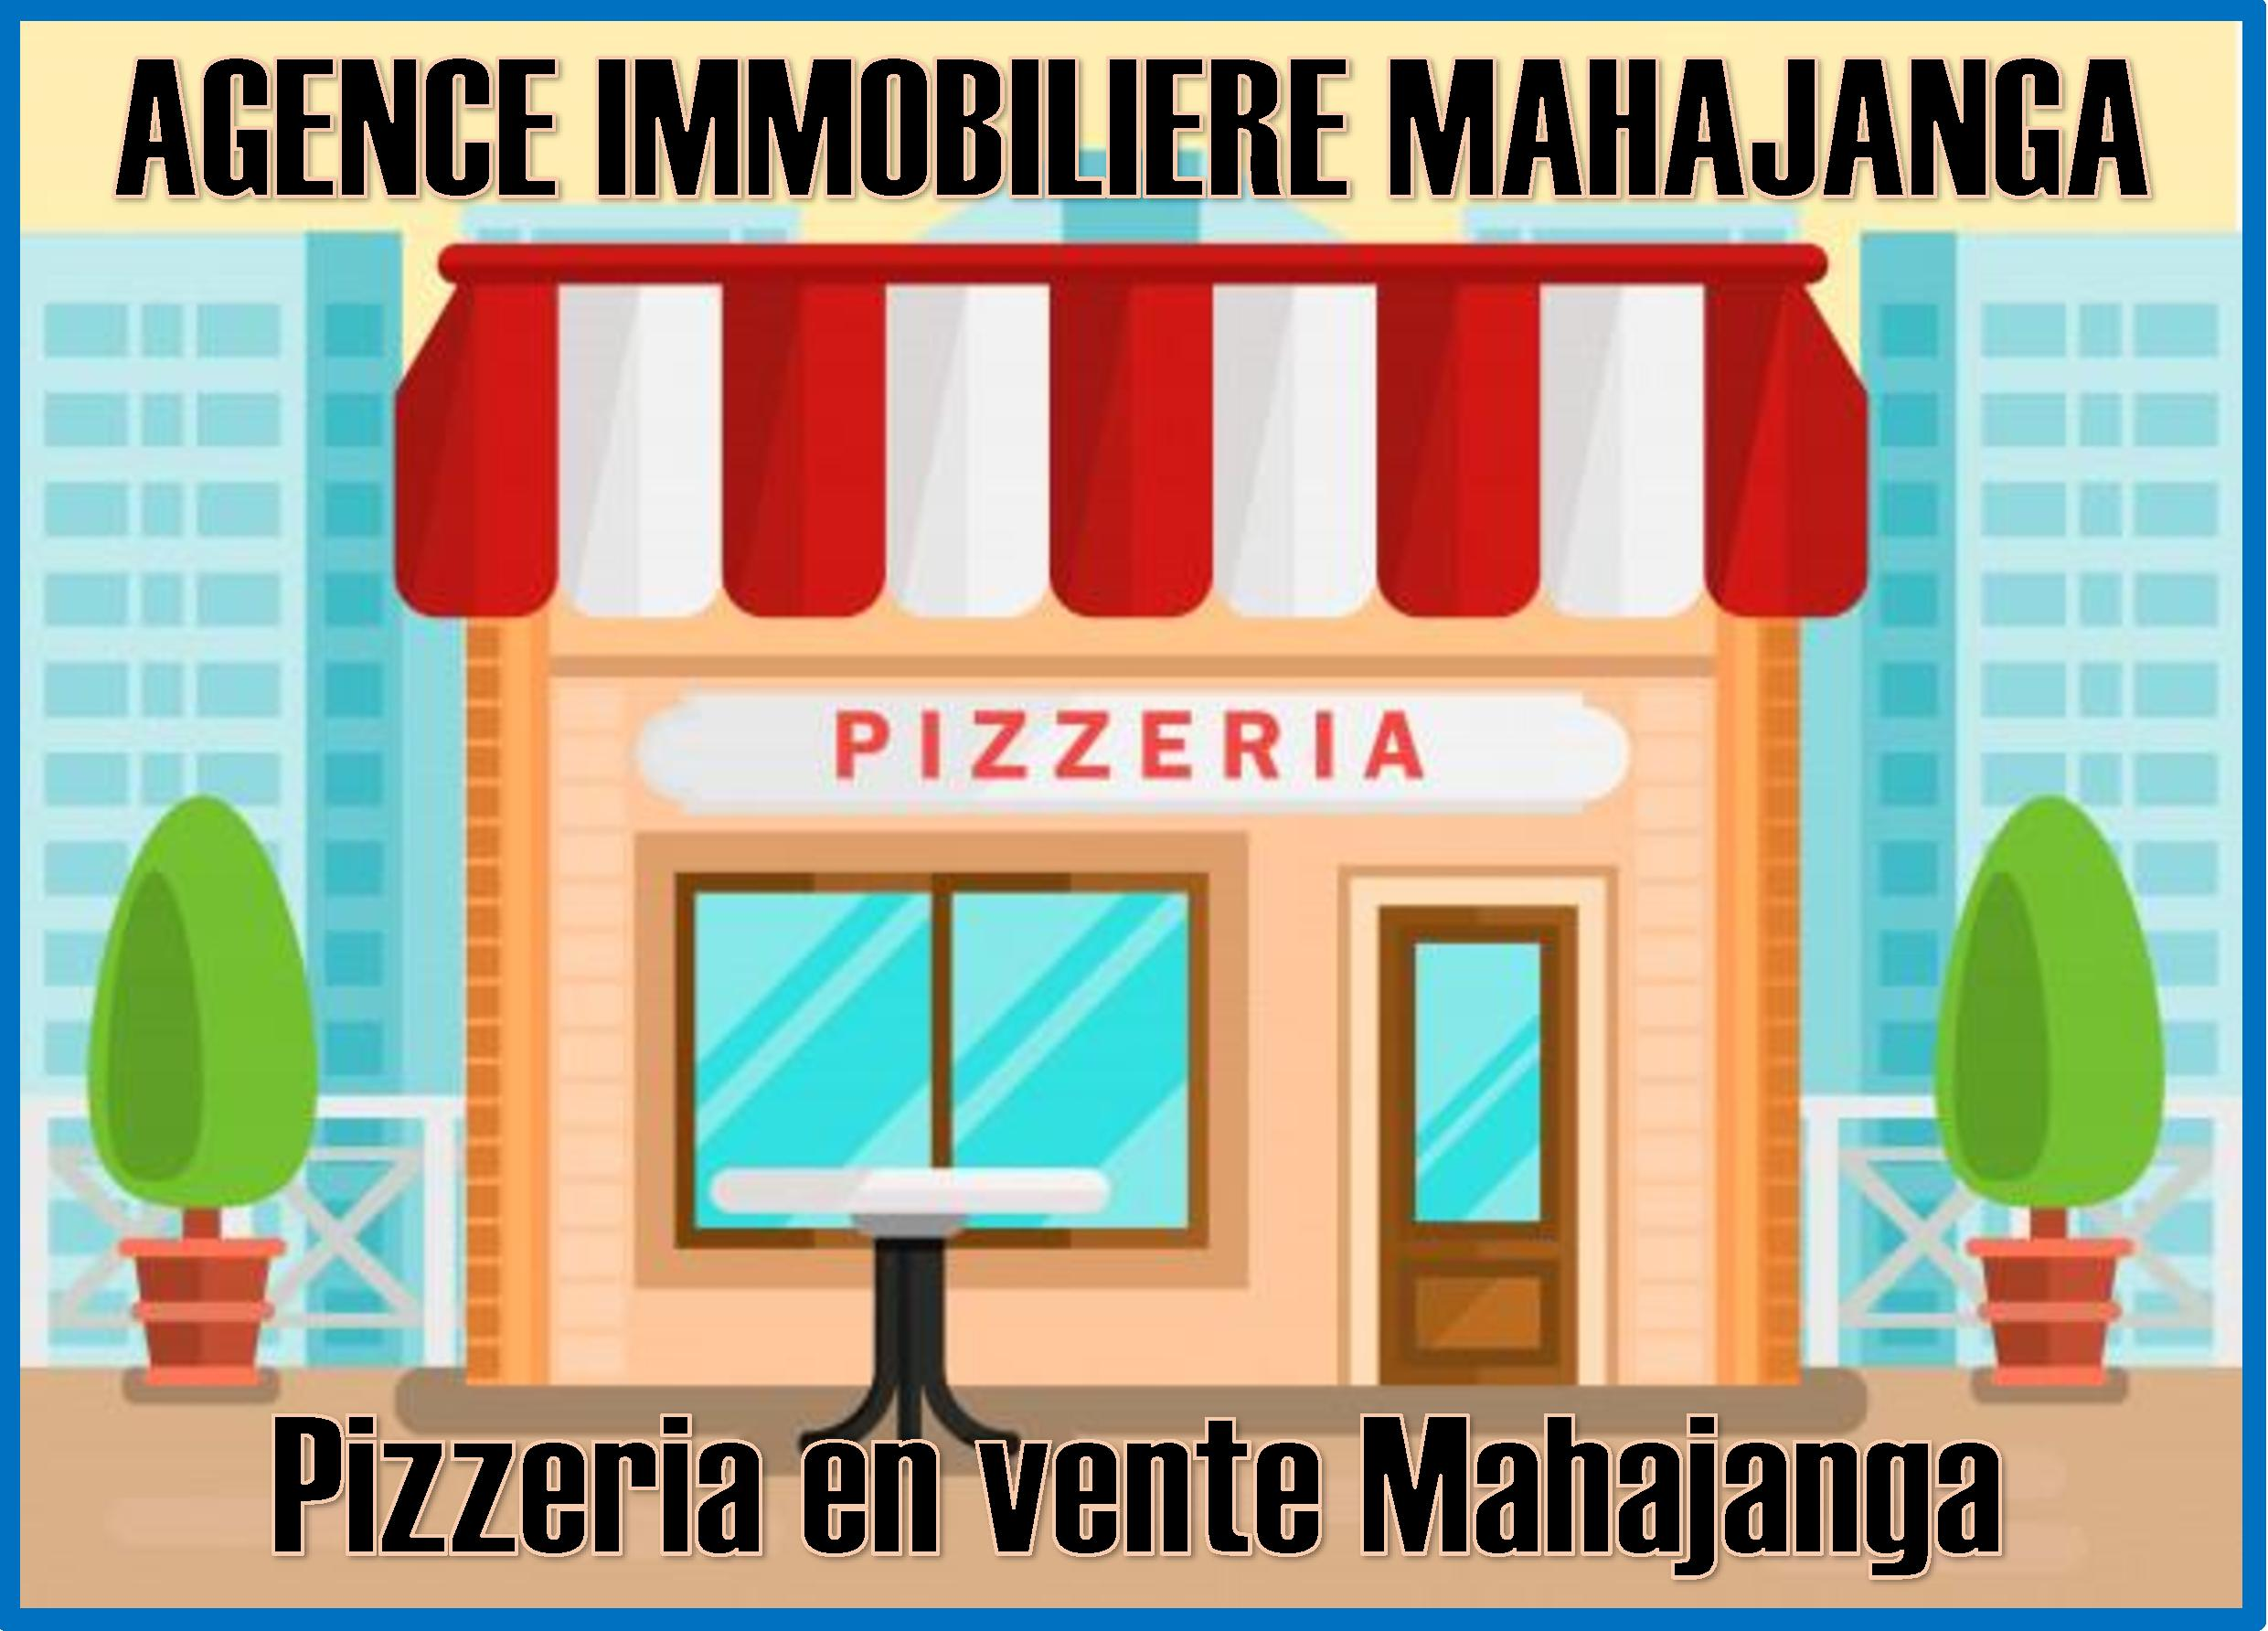 vente-pizzeria-mahajanga.jpg